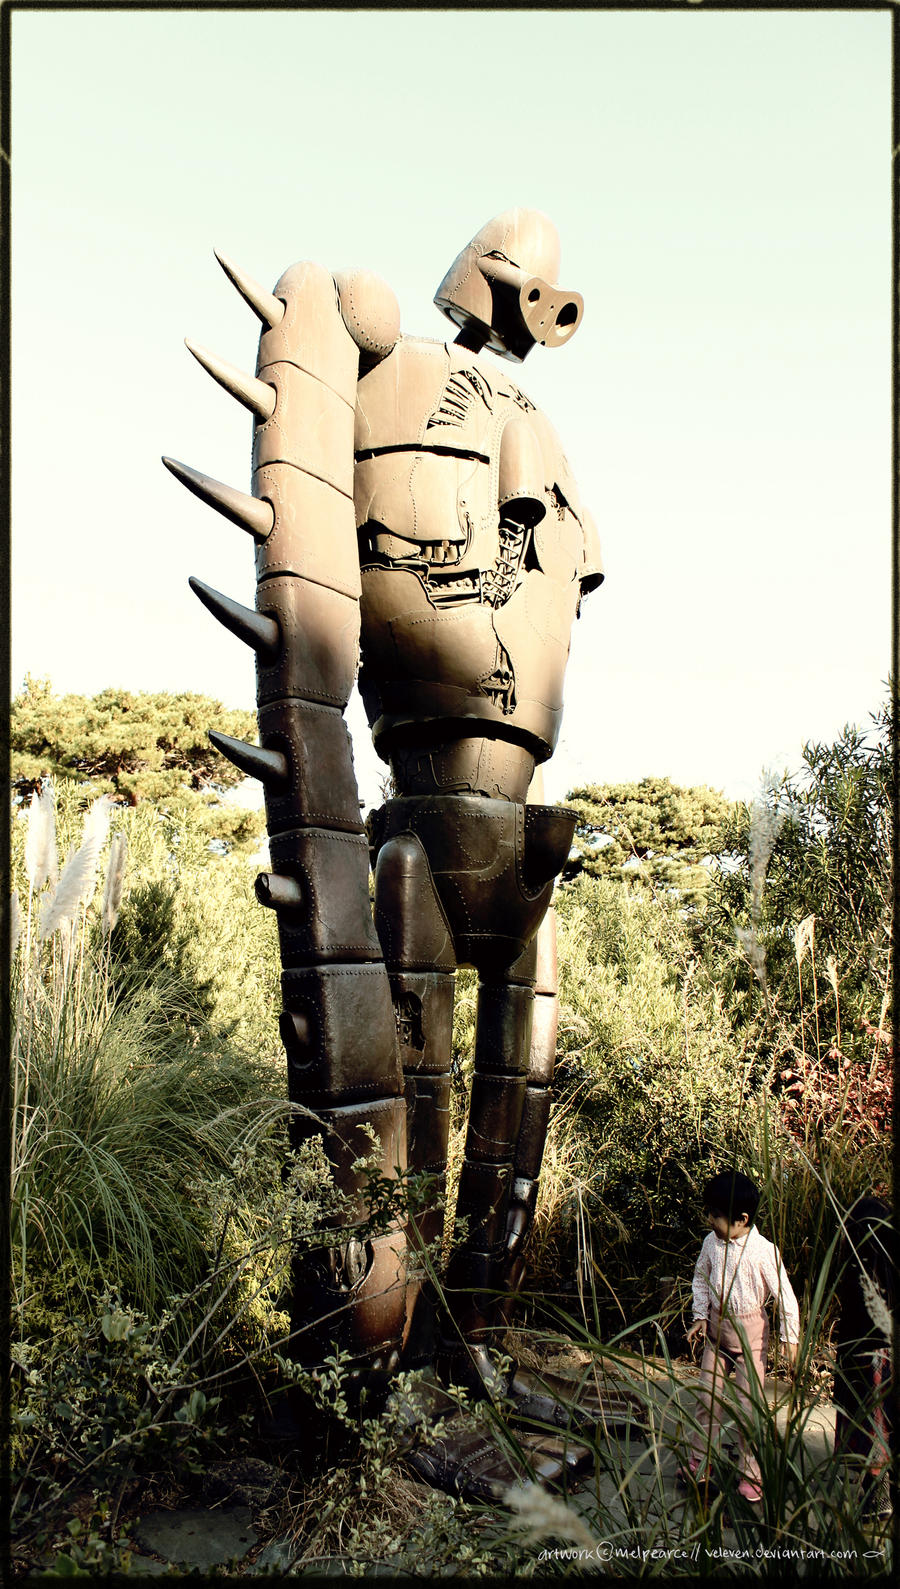 japan - laputa robot (photo) by Veleven